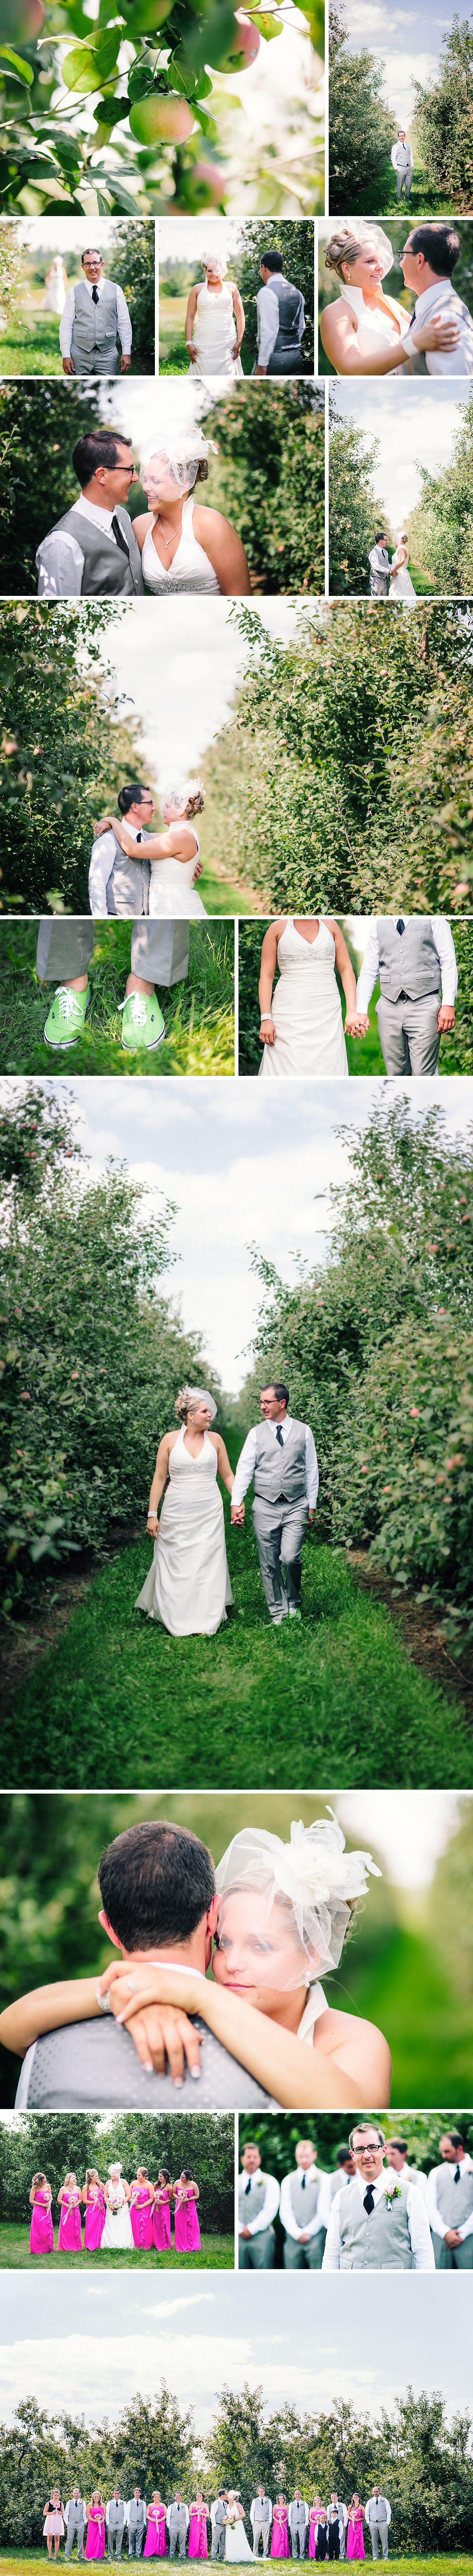 Chicago_Fine_Art_Wedding_Photography_andy-tori2.jpg